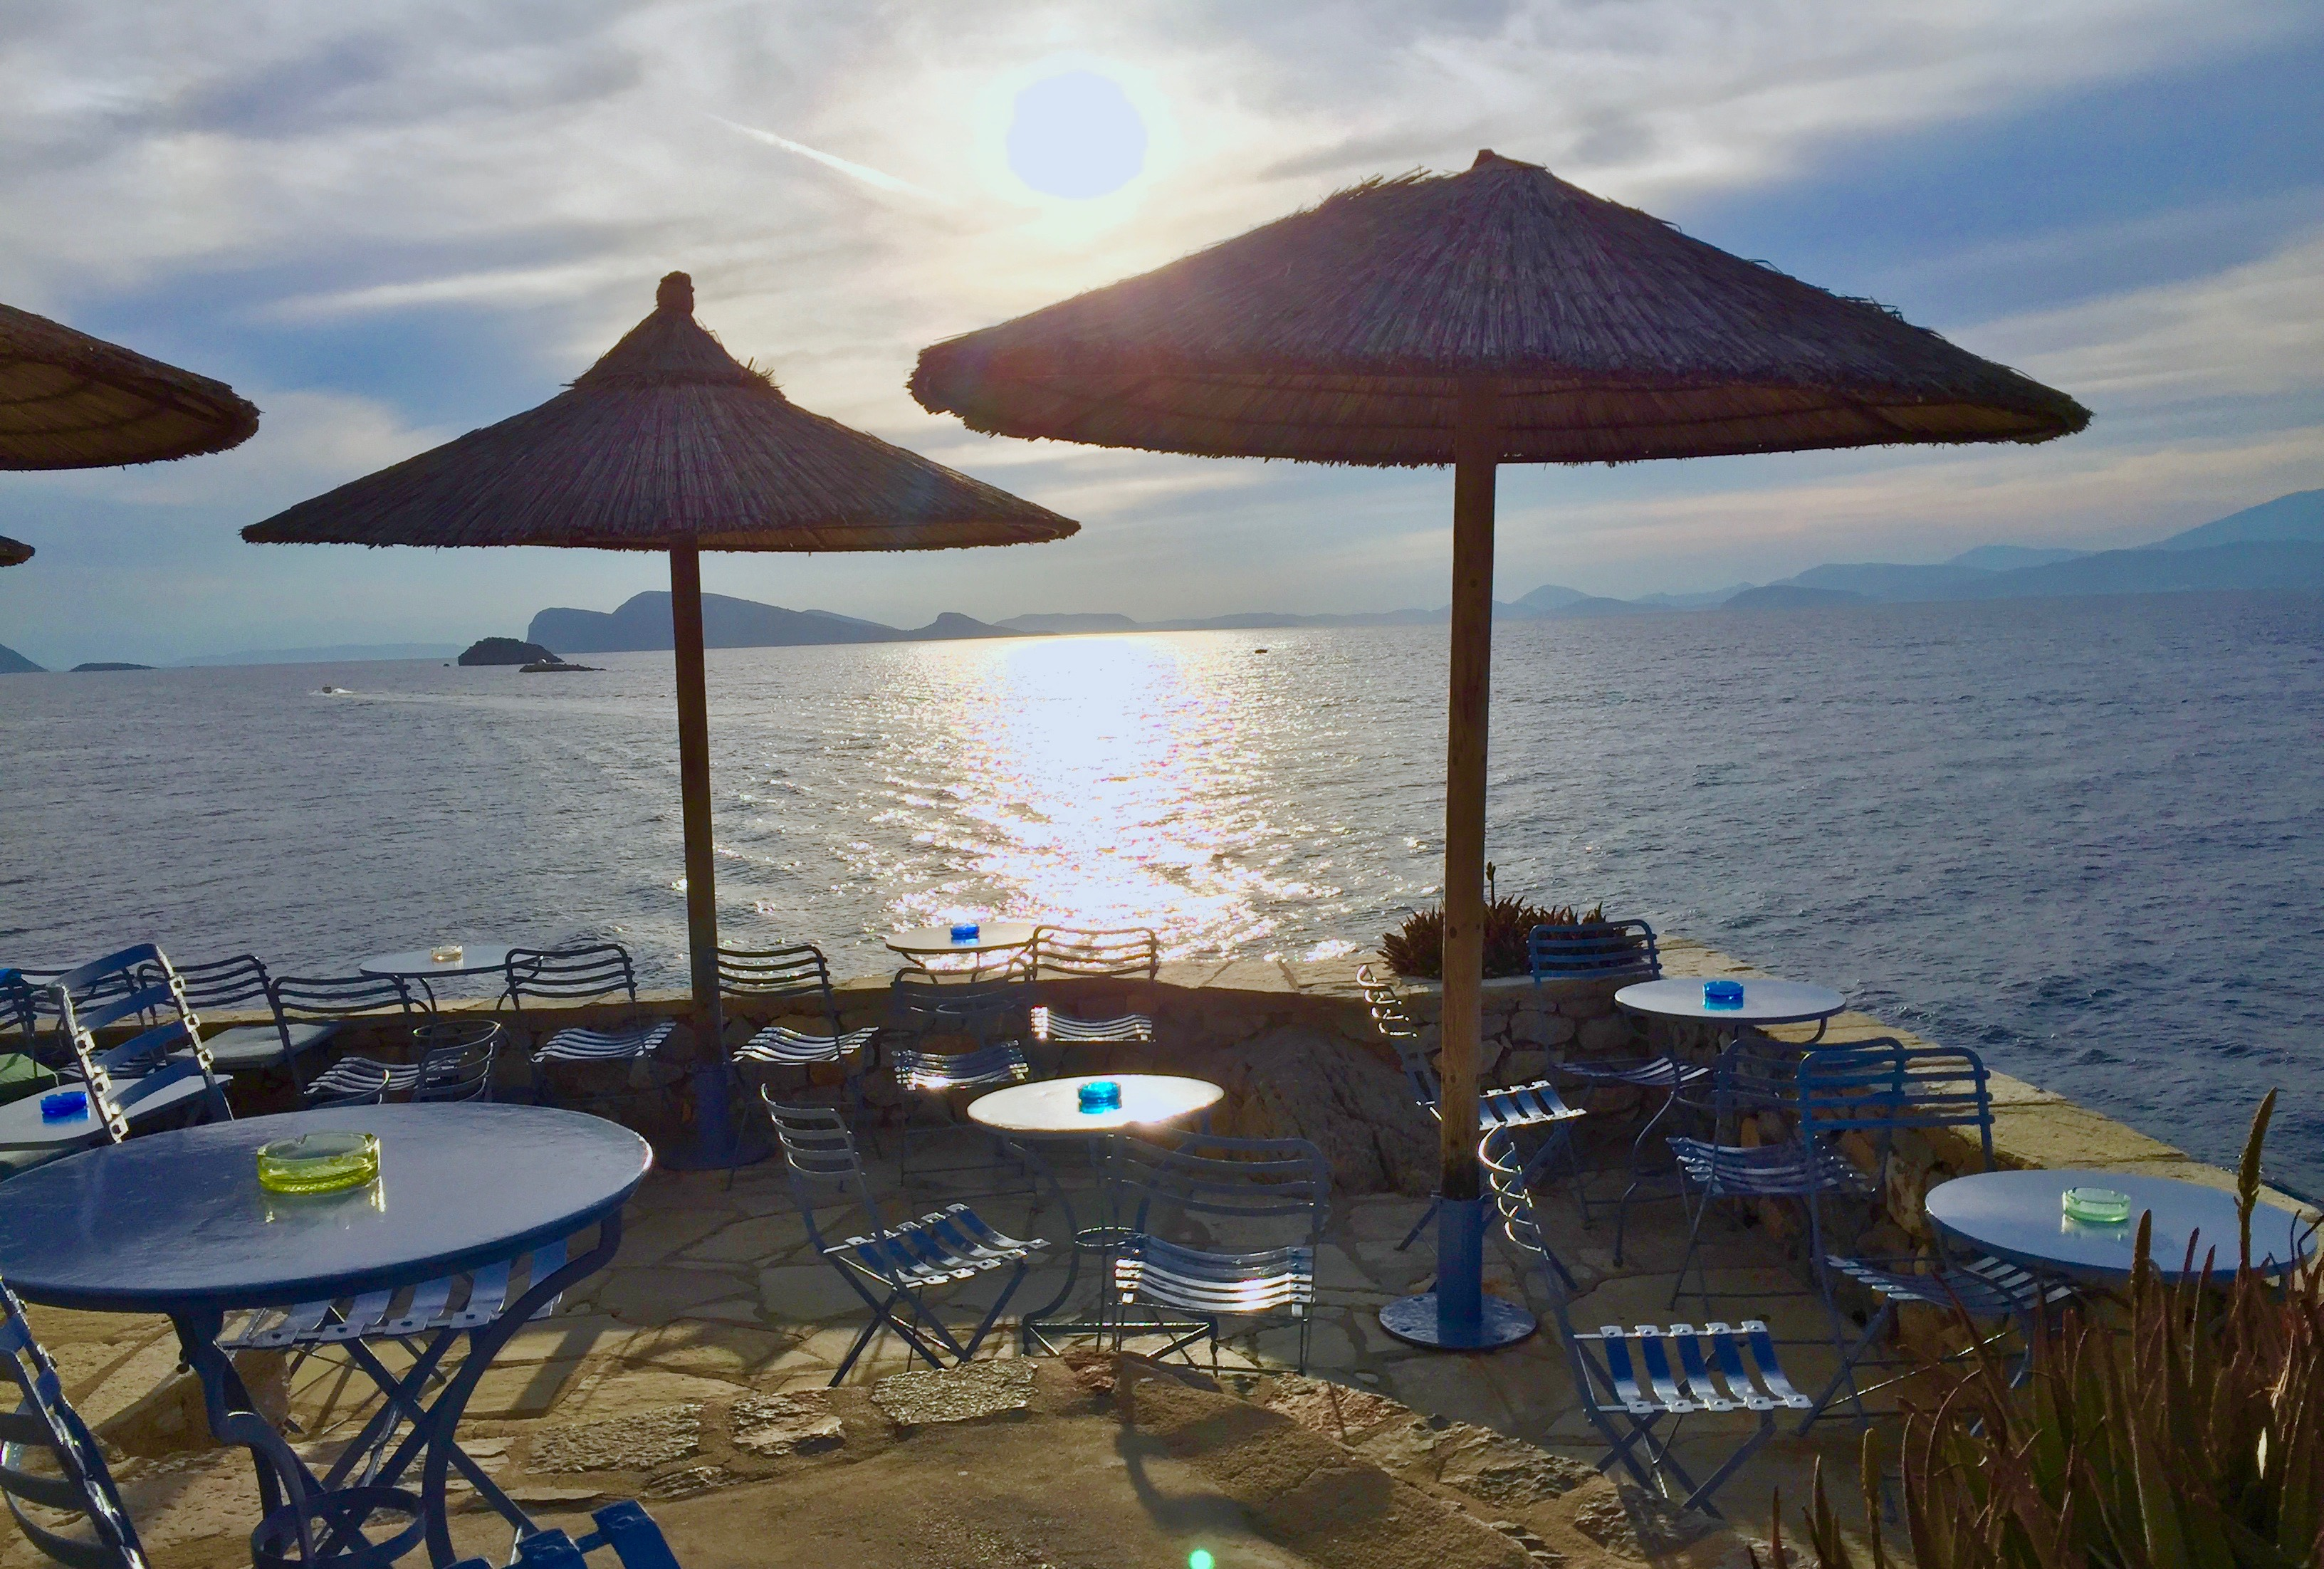 hydronetta_hydra_islands_lustforthesublime